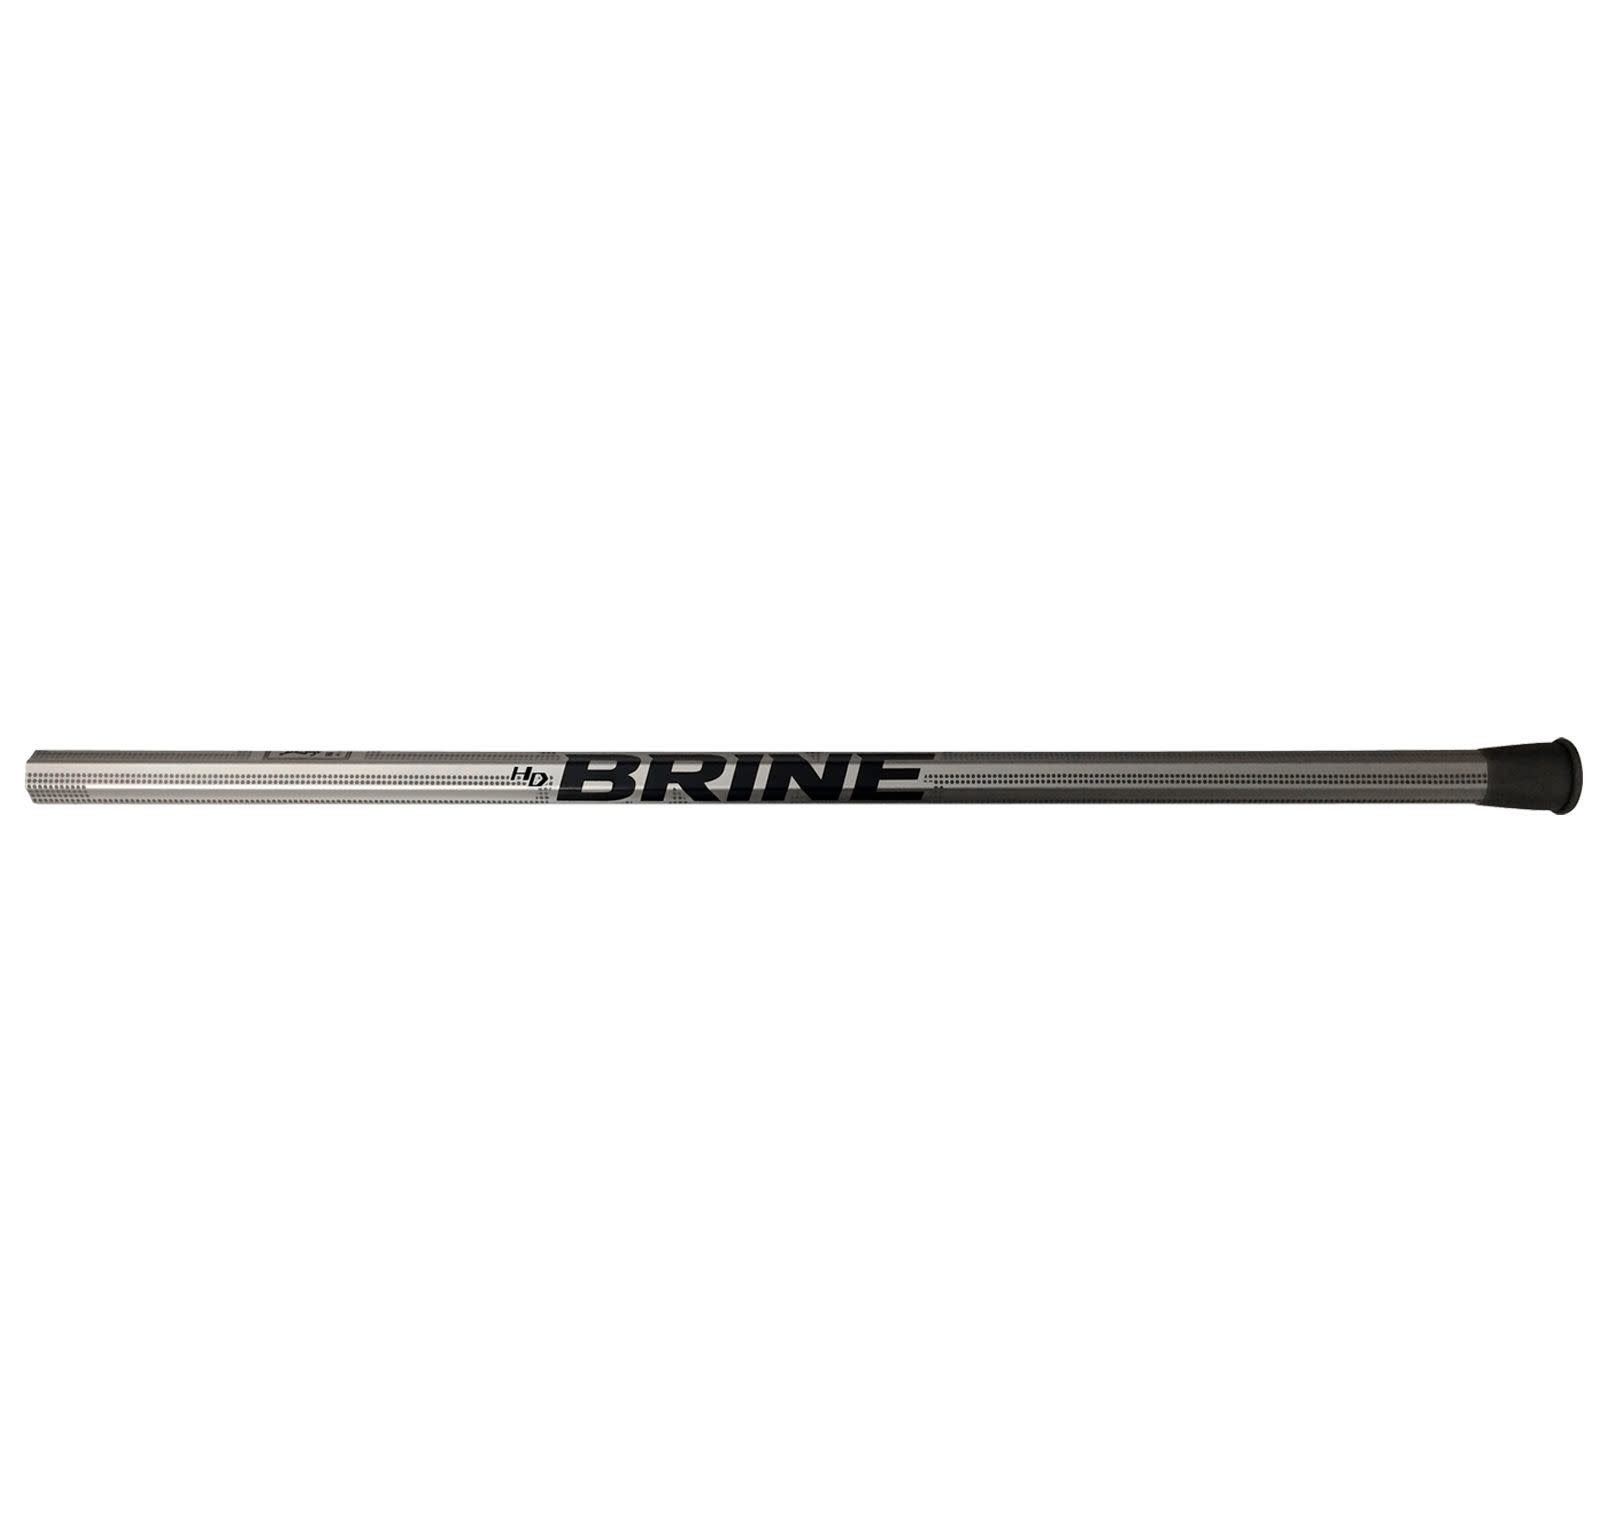 Brine BRINE 6065 HD ALLOY HANDLE ATK LACROSSE